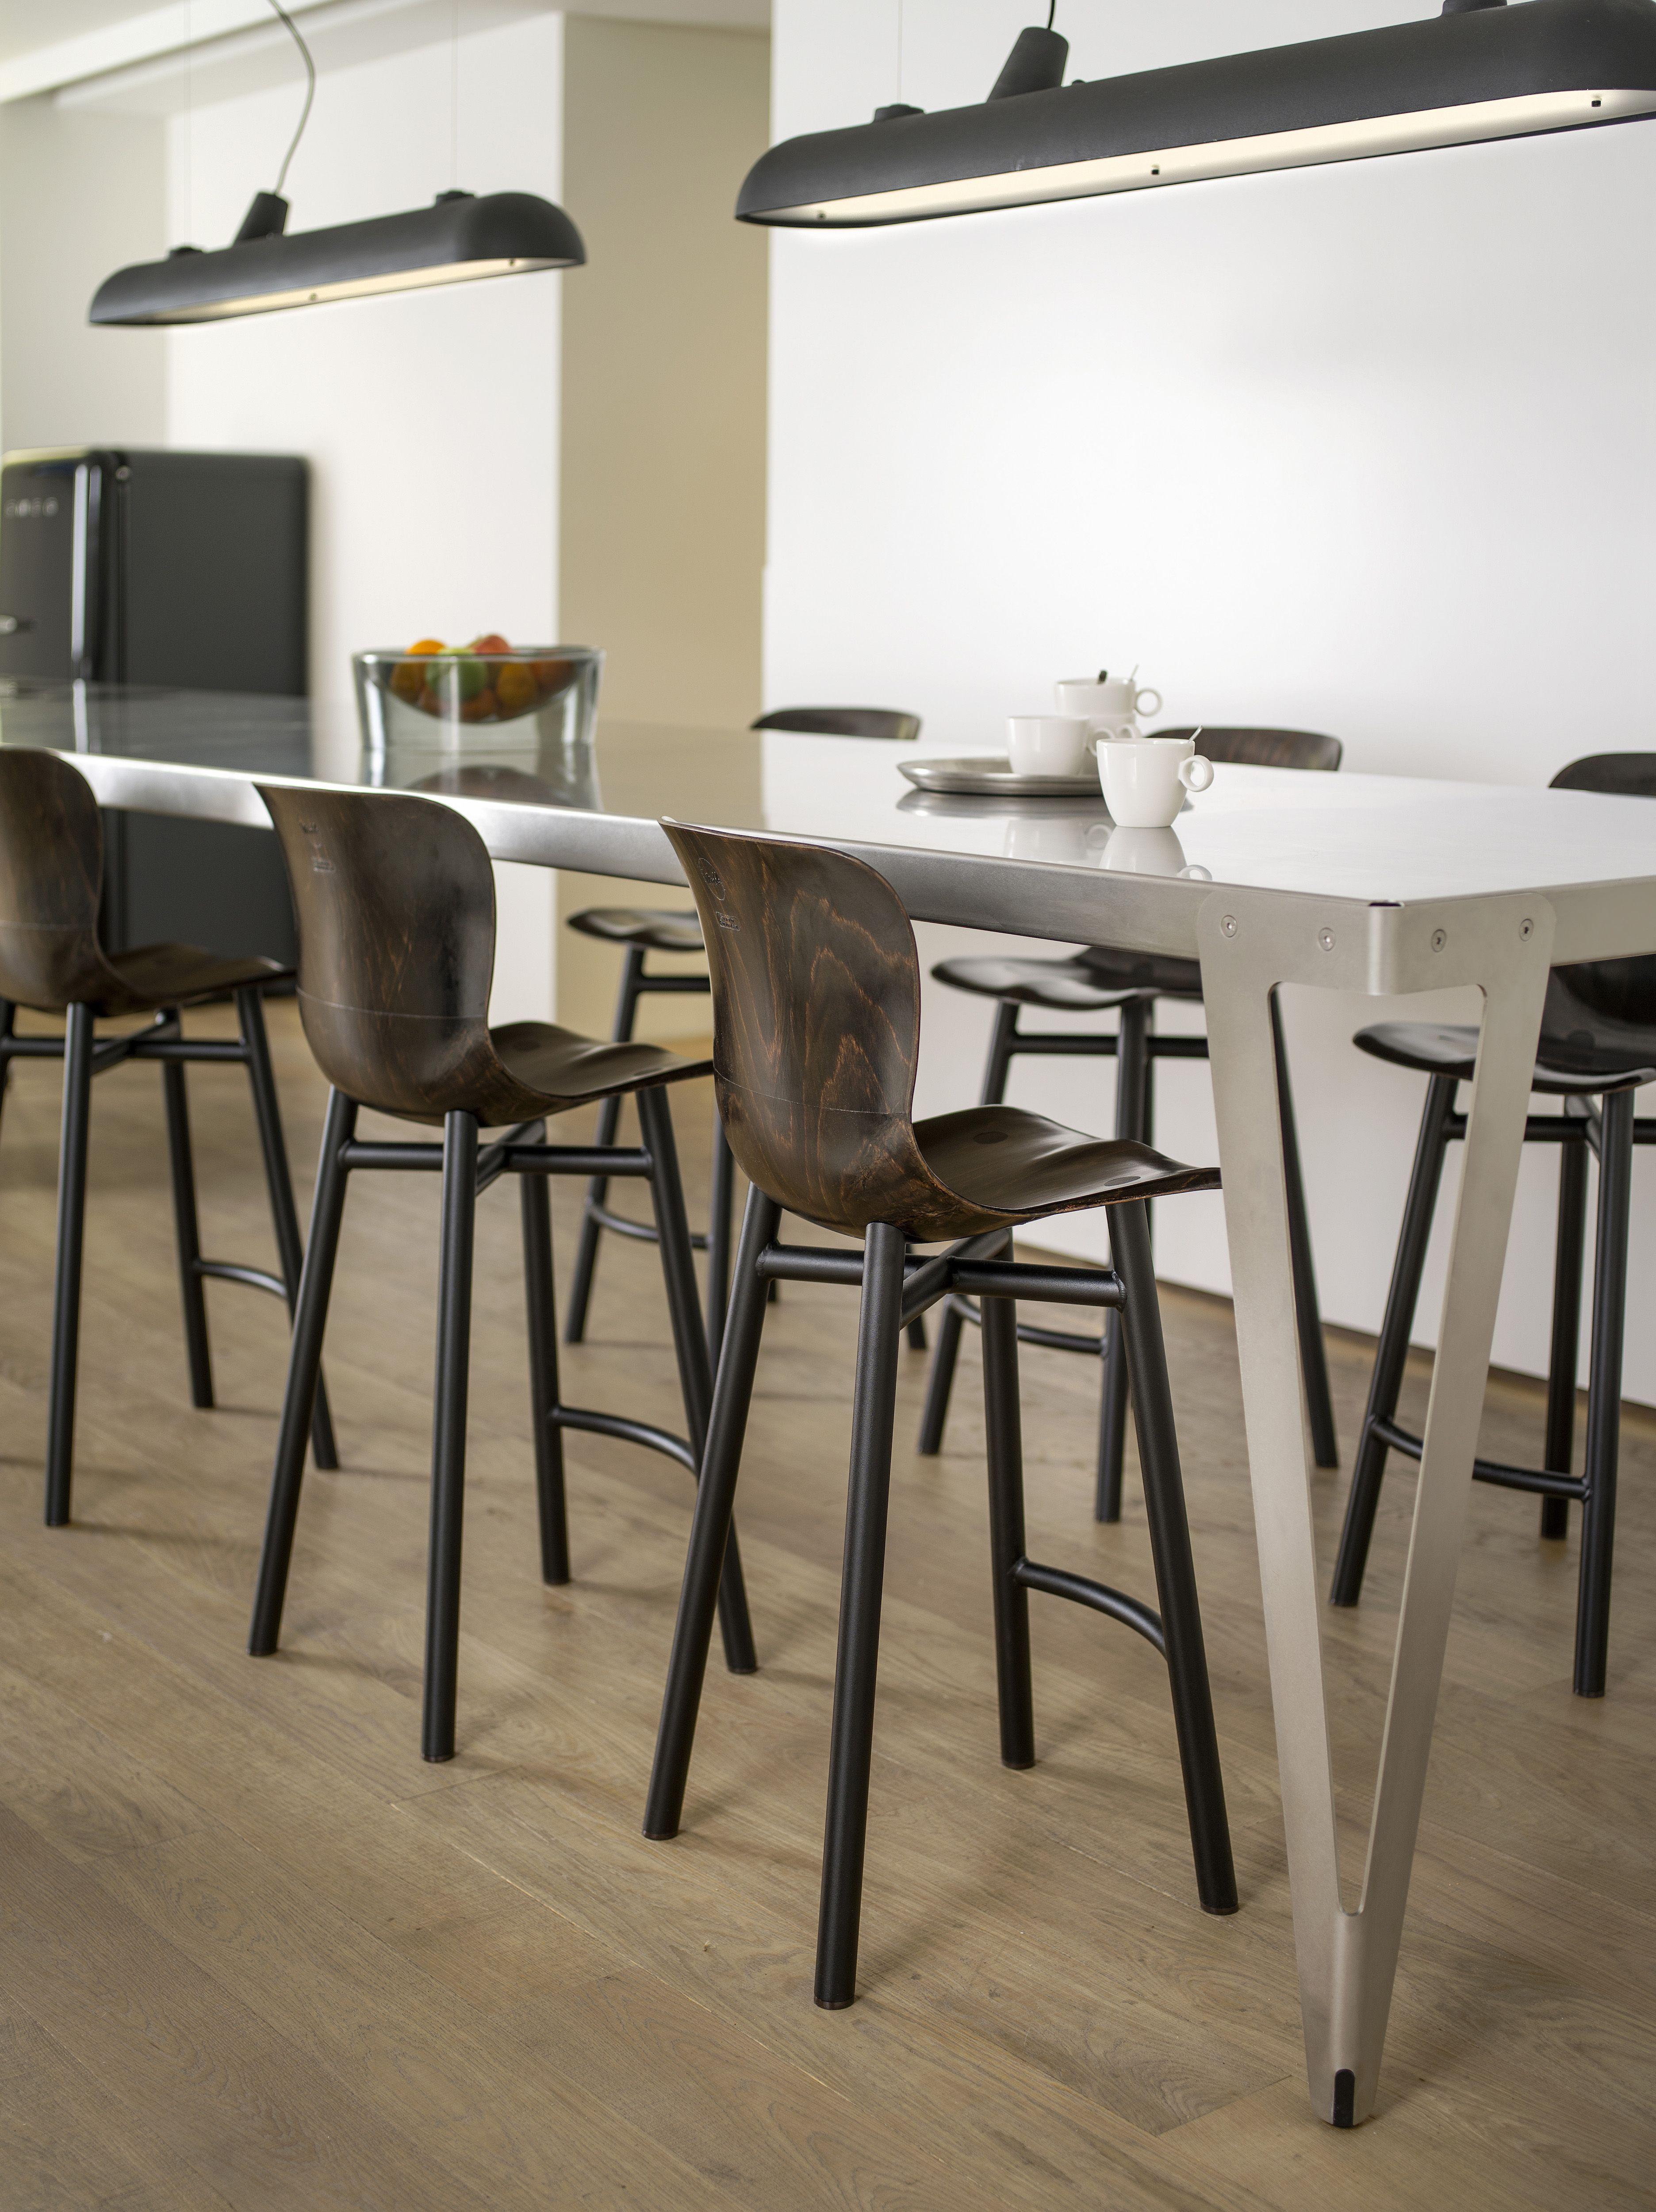 Functionals – Wendela – Chair Designer: Serener http://functionals.eu/products/seats/wendela_chair